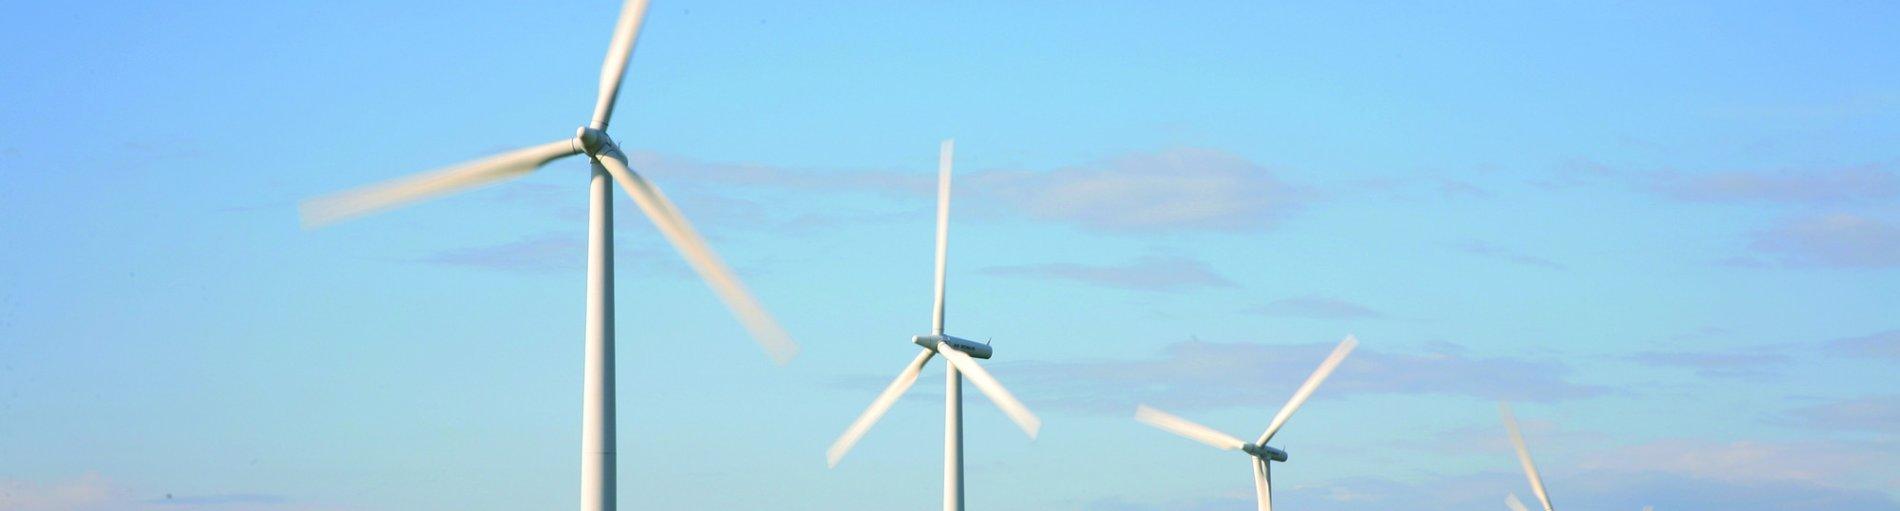 Windräder (Quelle: WFB / Jens Lehmkühler)